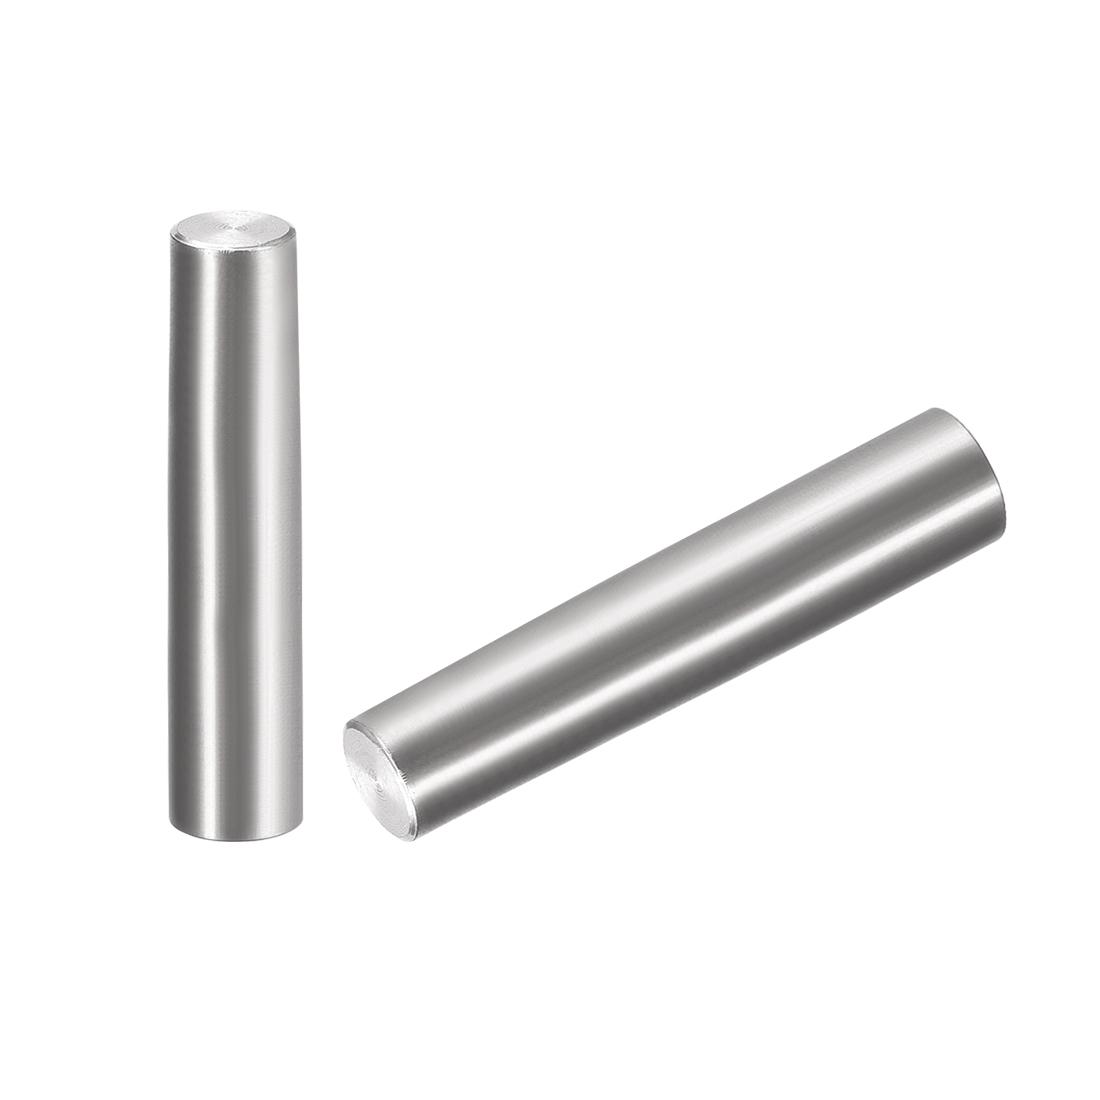 2Pcs 8mm x 40mm 1:50 Taper Pin 304 Stainless Steel Shelf Support Pin Fasten